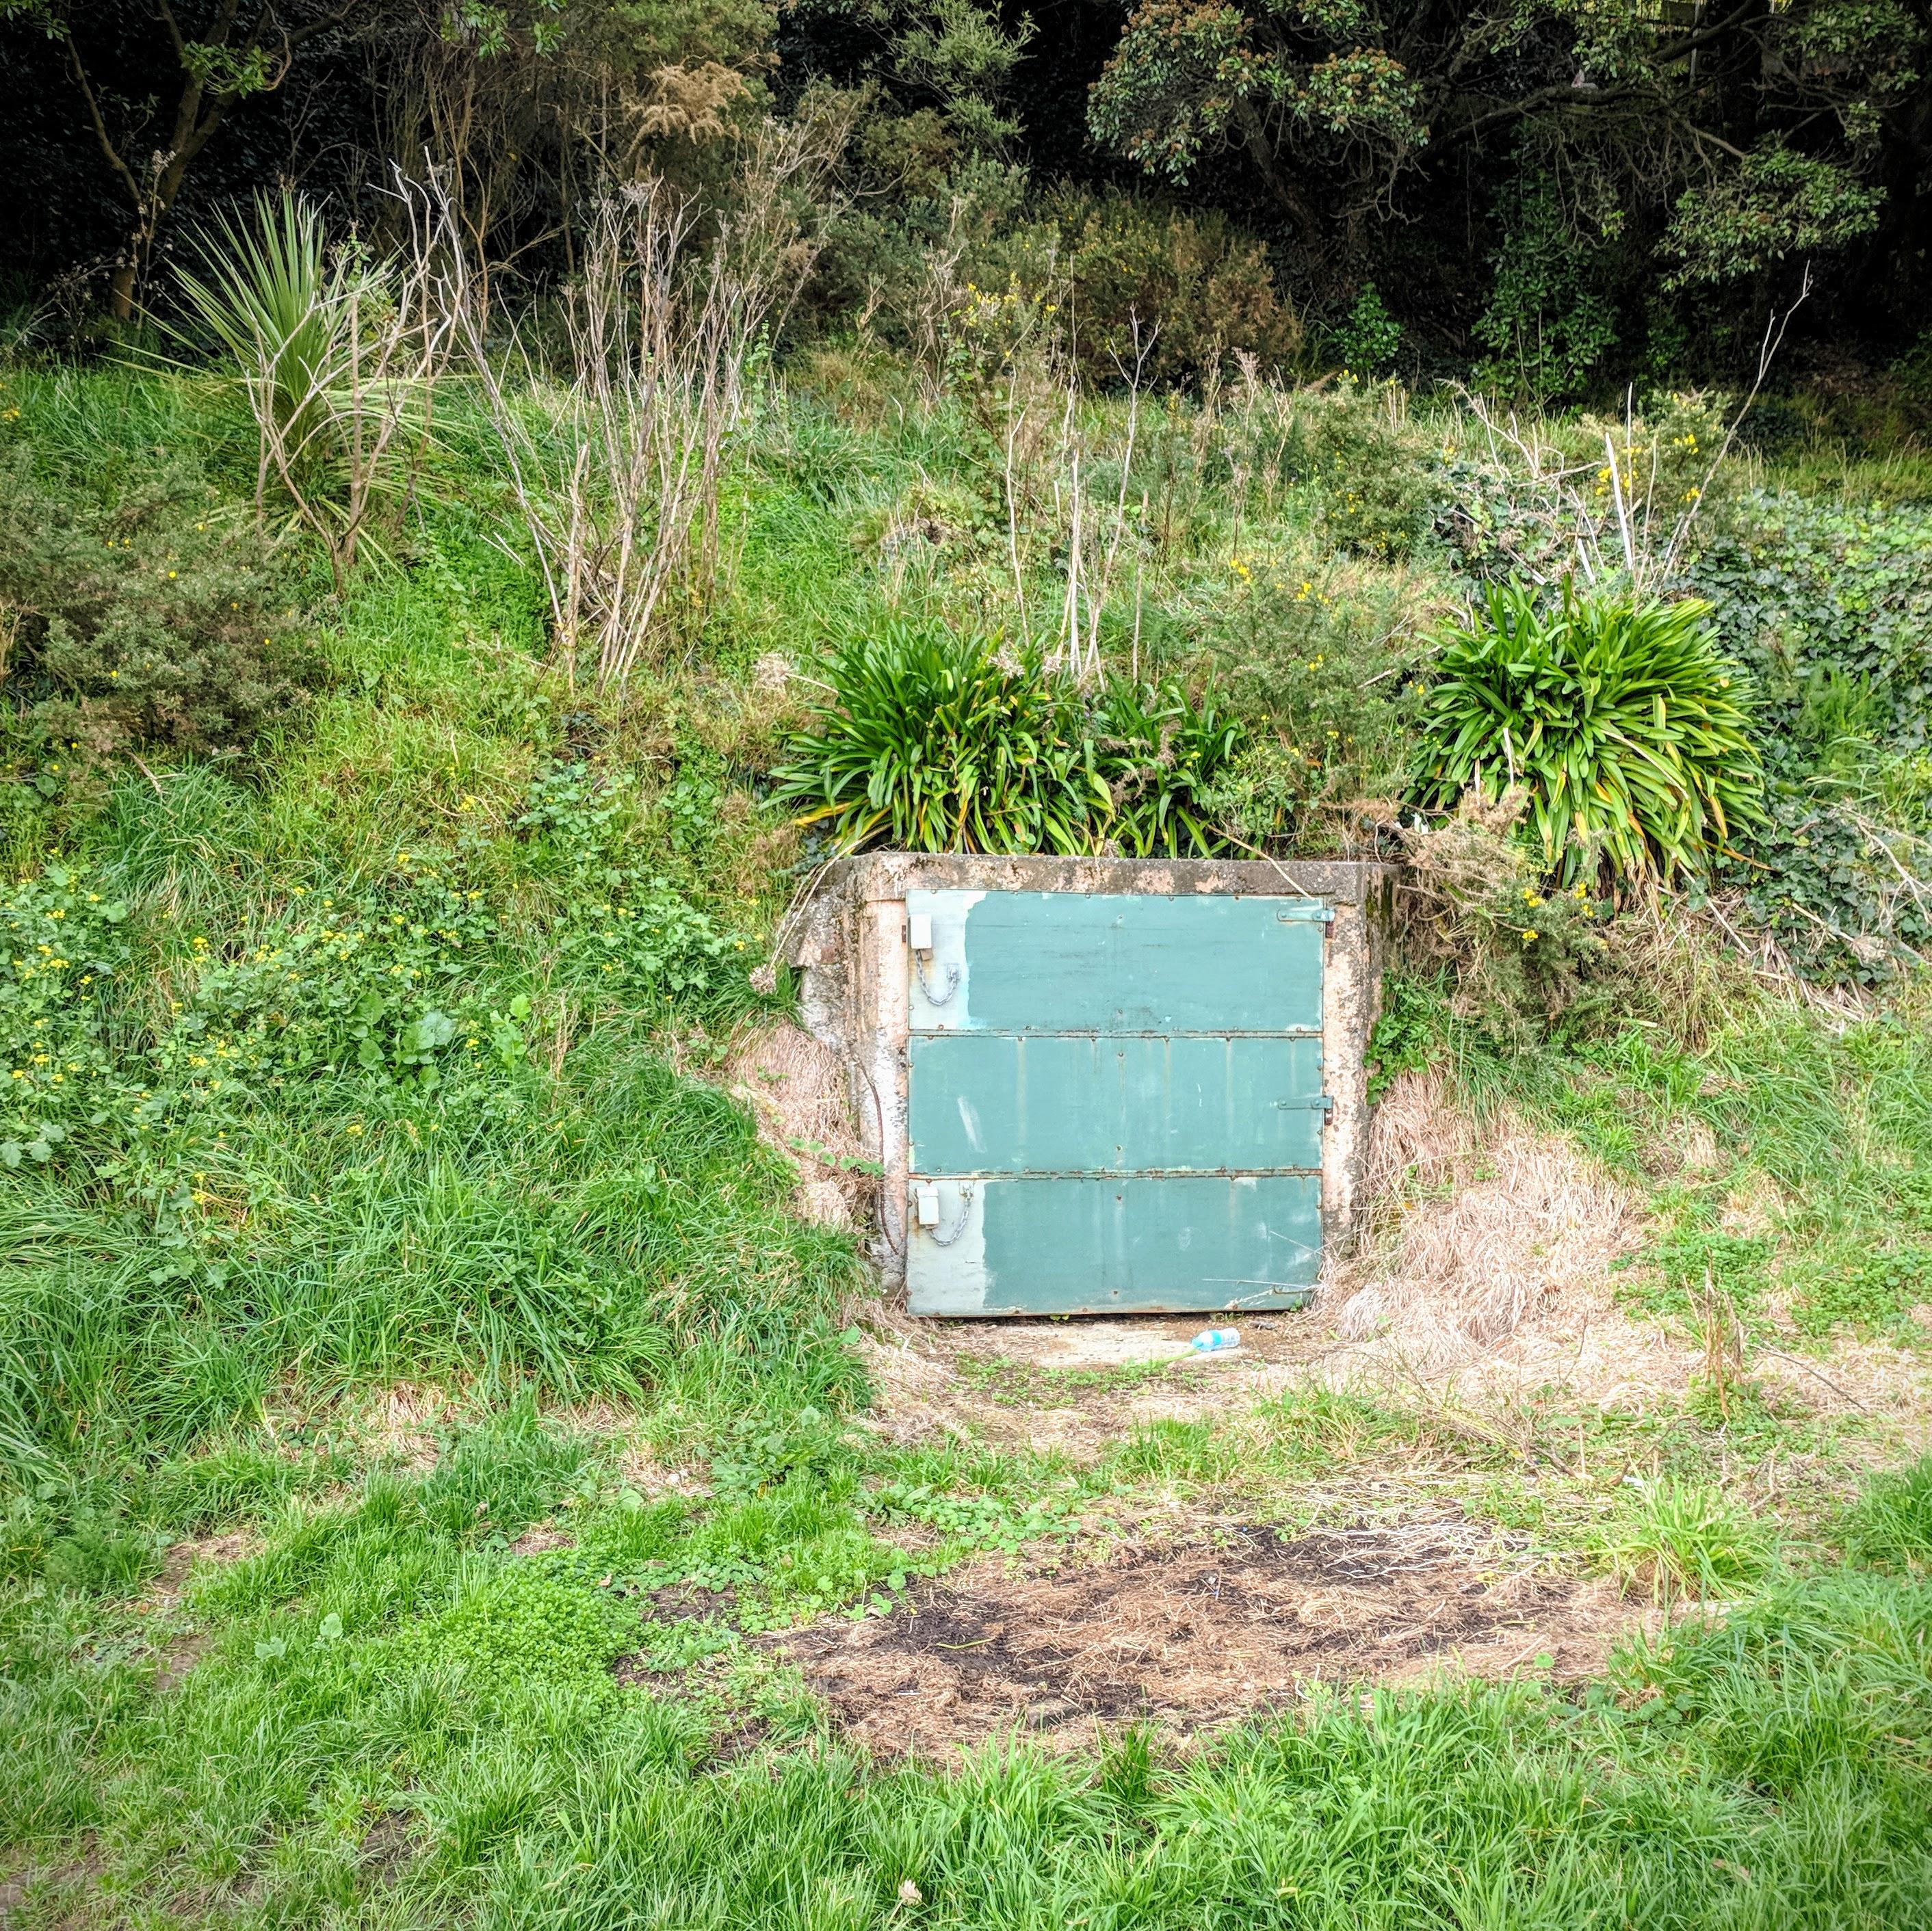 A door in a grass bank